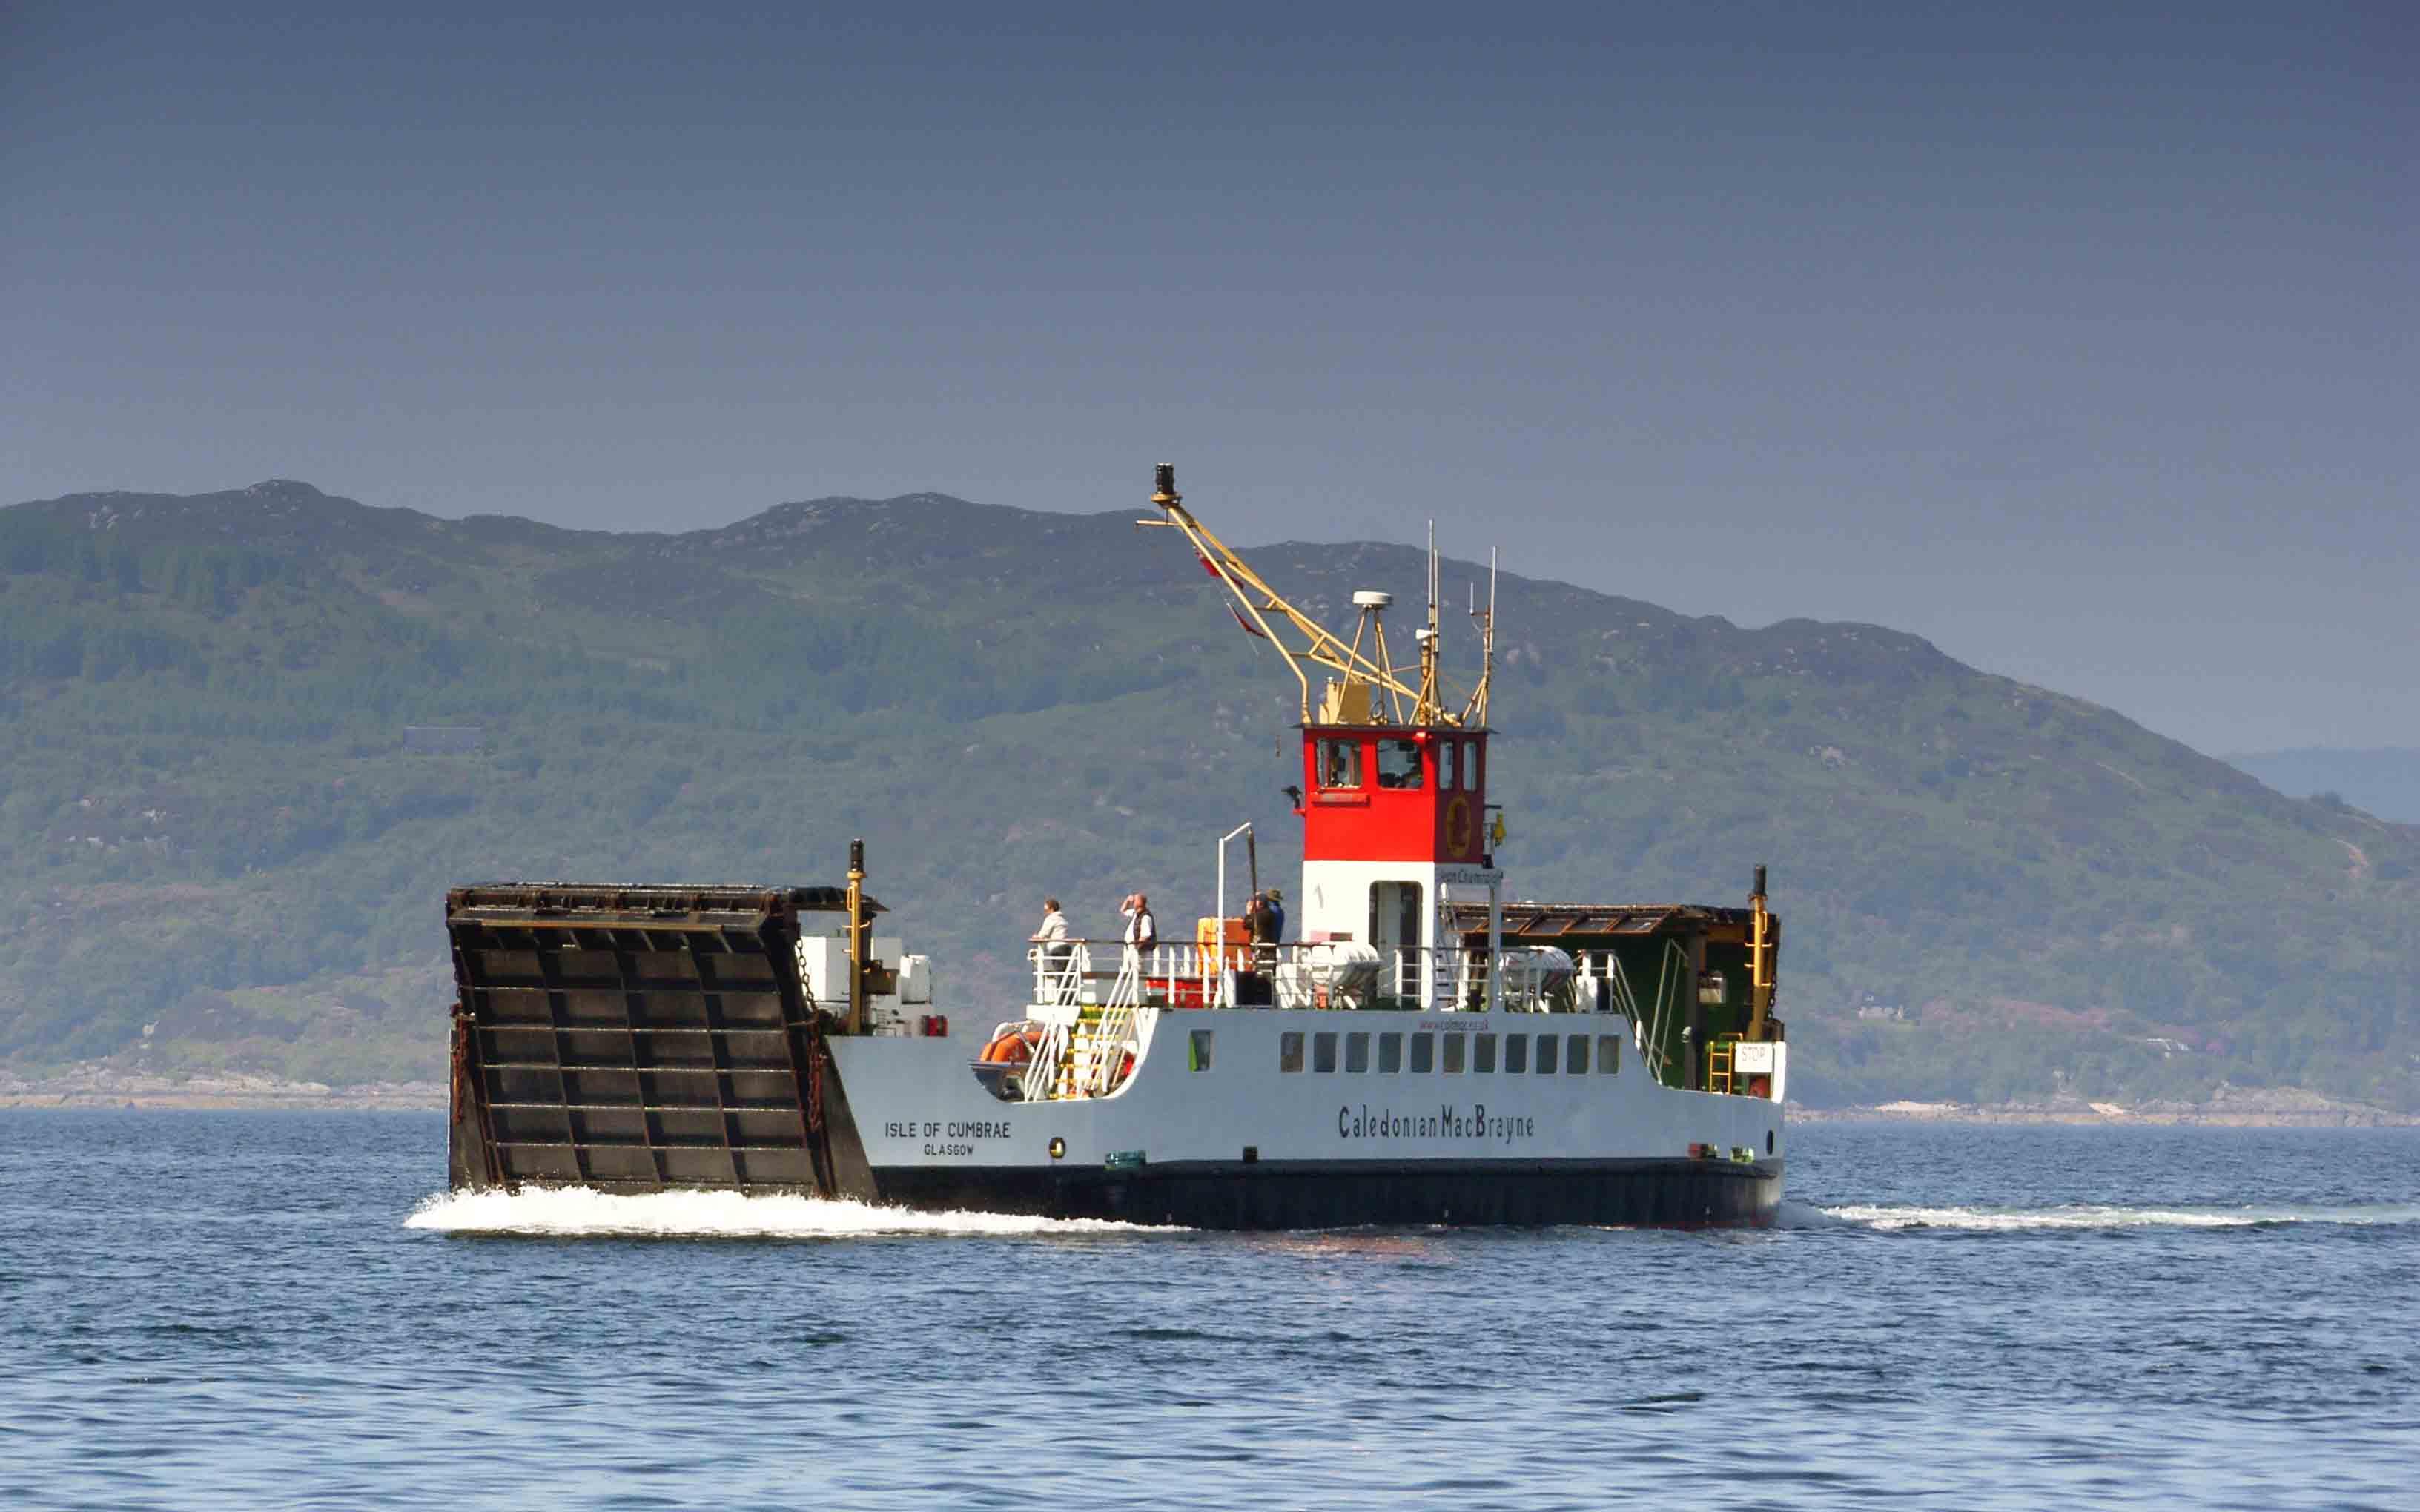 Isle of Cumbrae crossing Loch Fyne (Ships of CalMac)